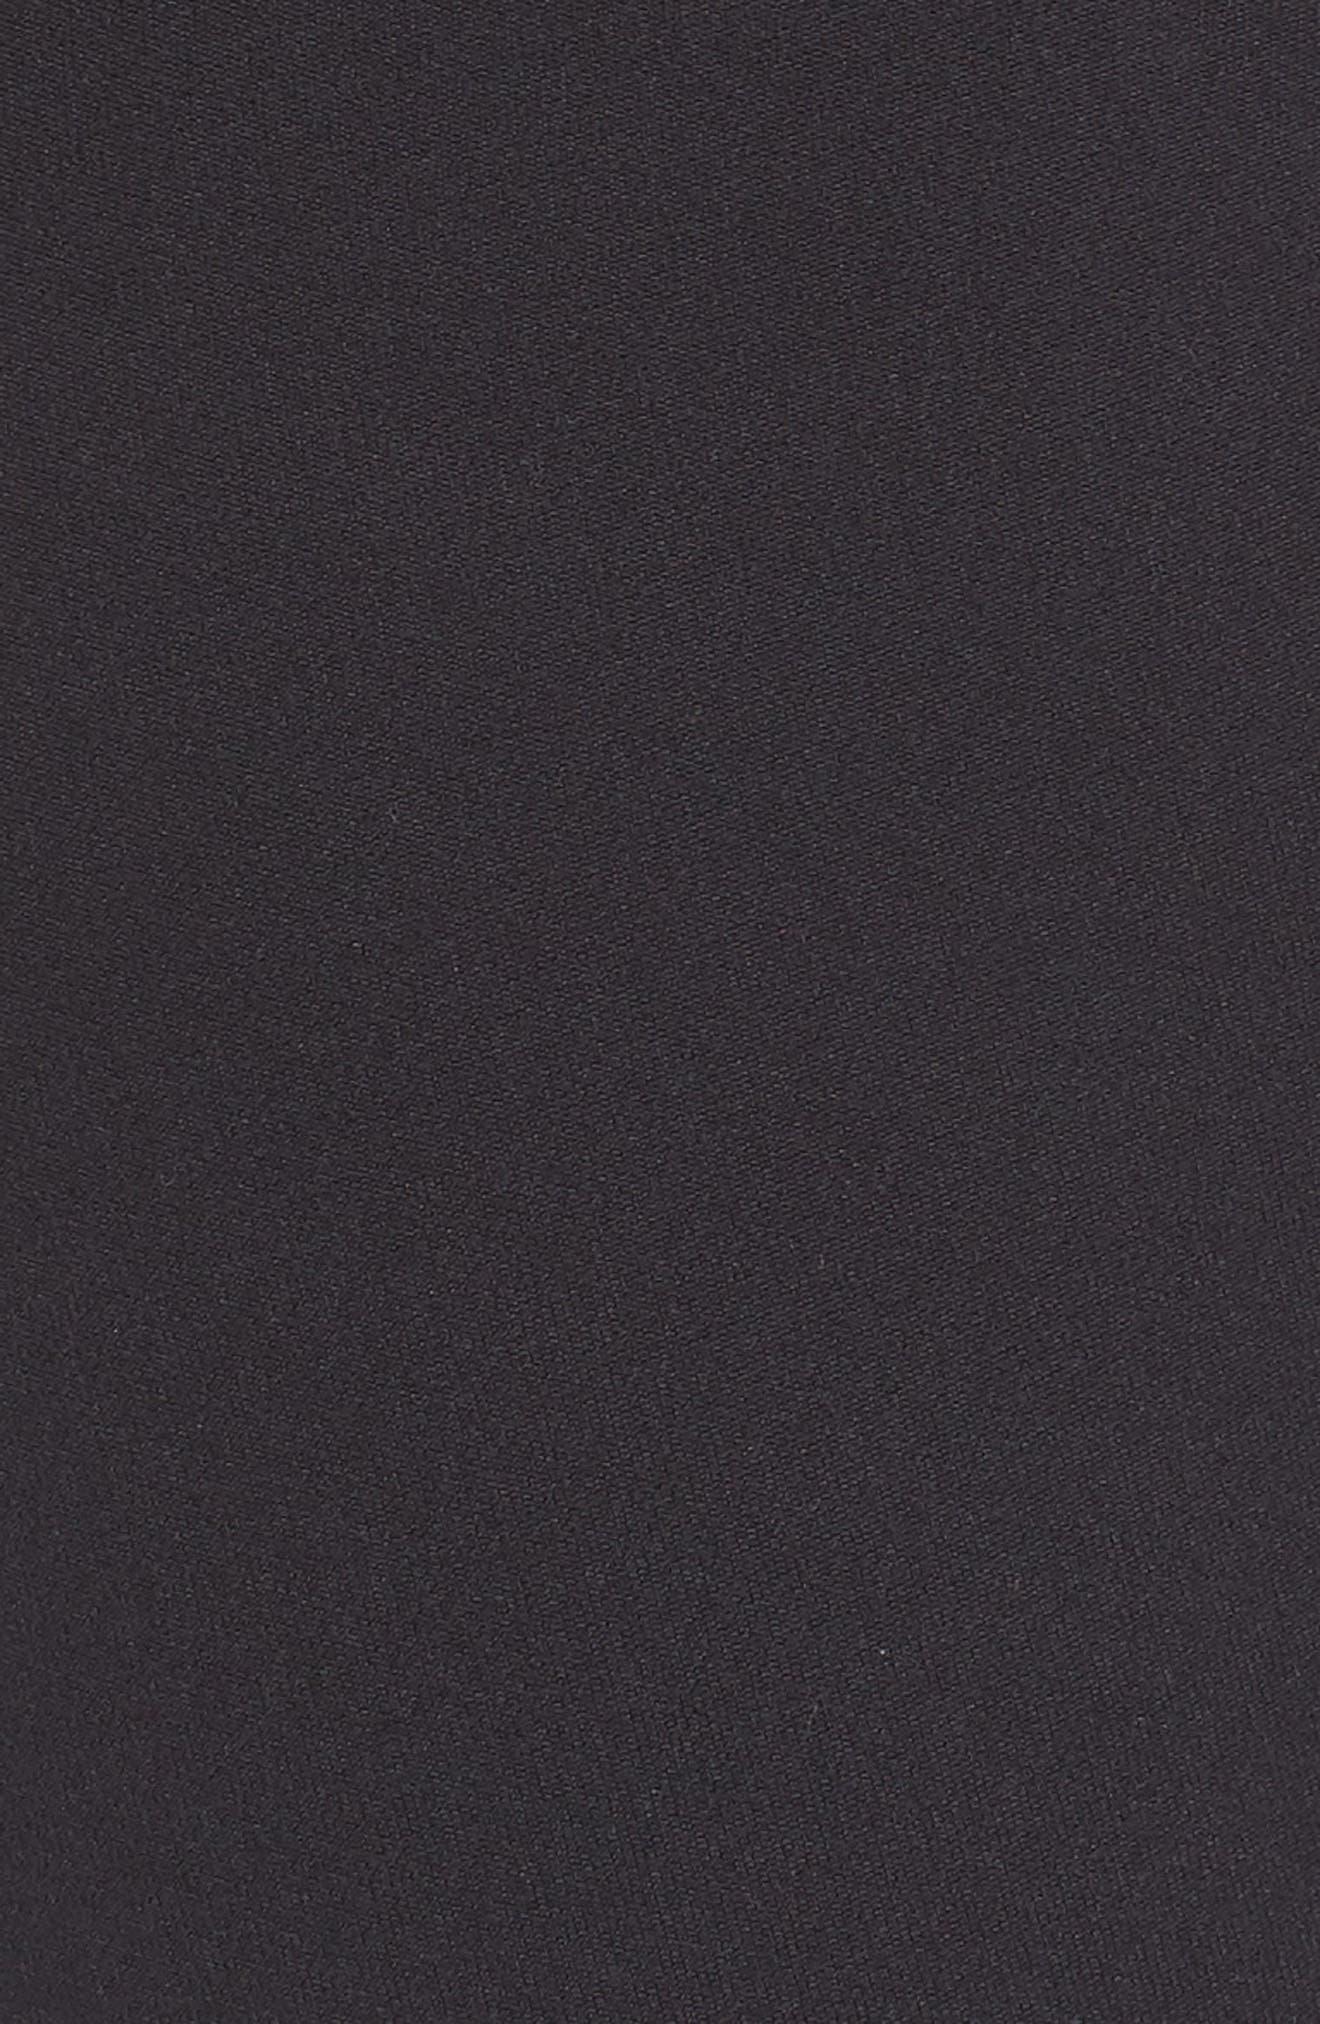 Believe This 3-Stripes High Waist Ankle Leggings,                             Alternate thumbnail 6, color,                             BLACK/ WHITE